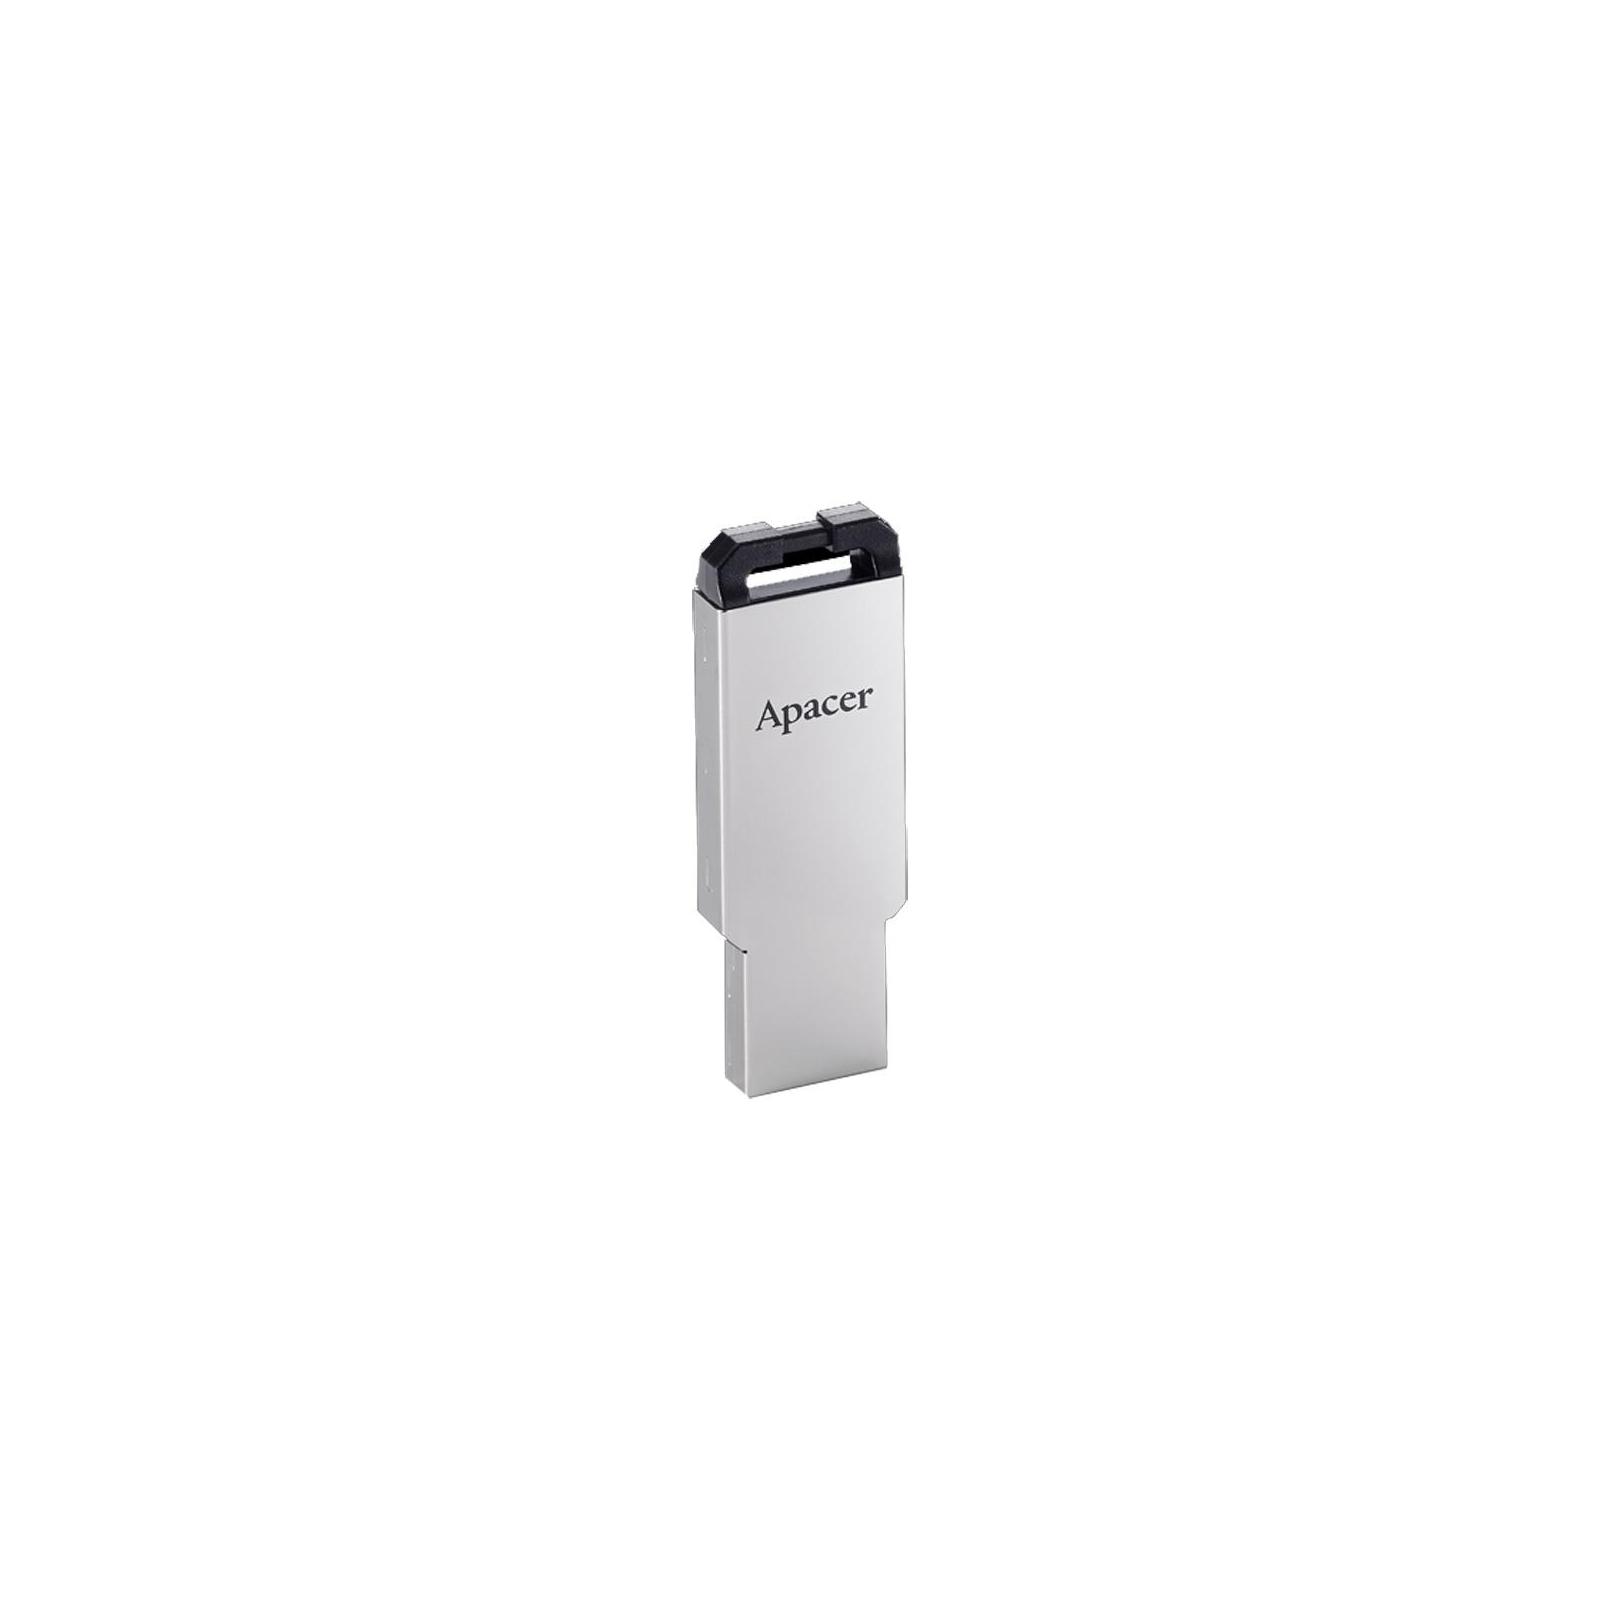 USB флеш накопитель Apacer 16GB AH310 Silver USB 2.0 (AP16GAH310S-1) изображение 2